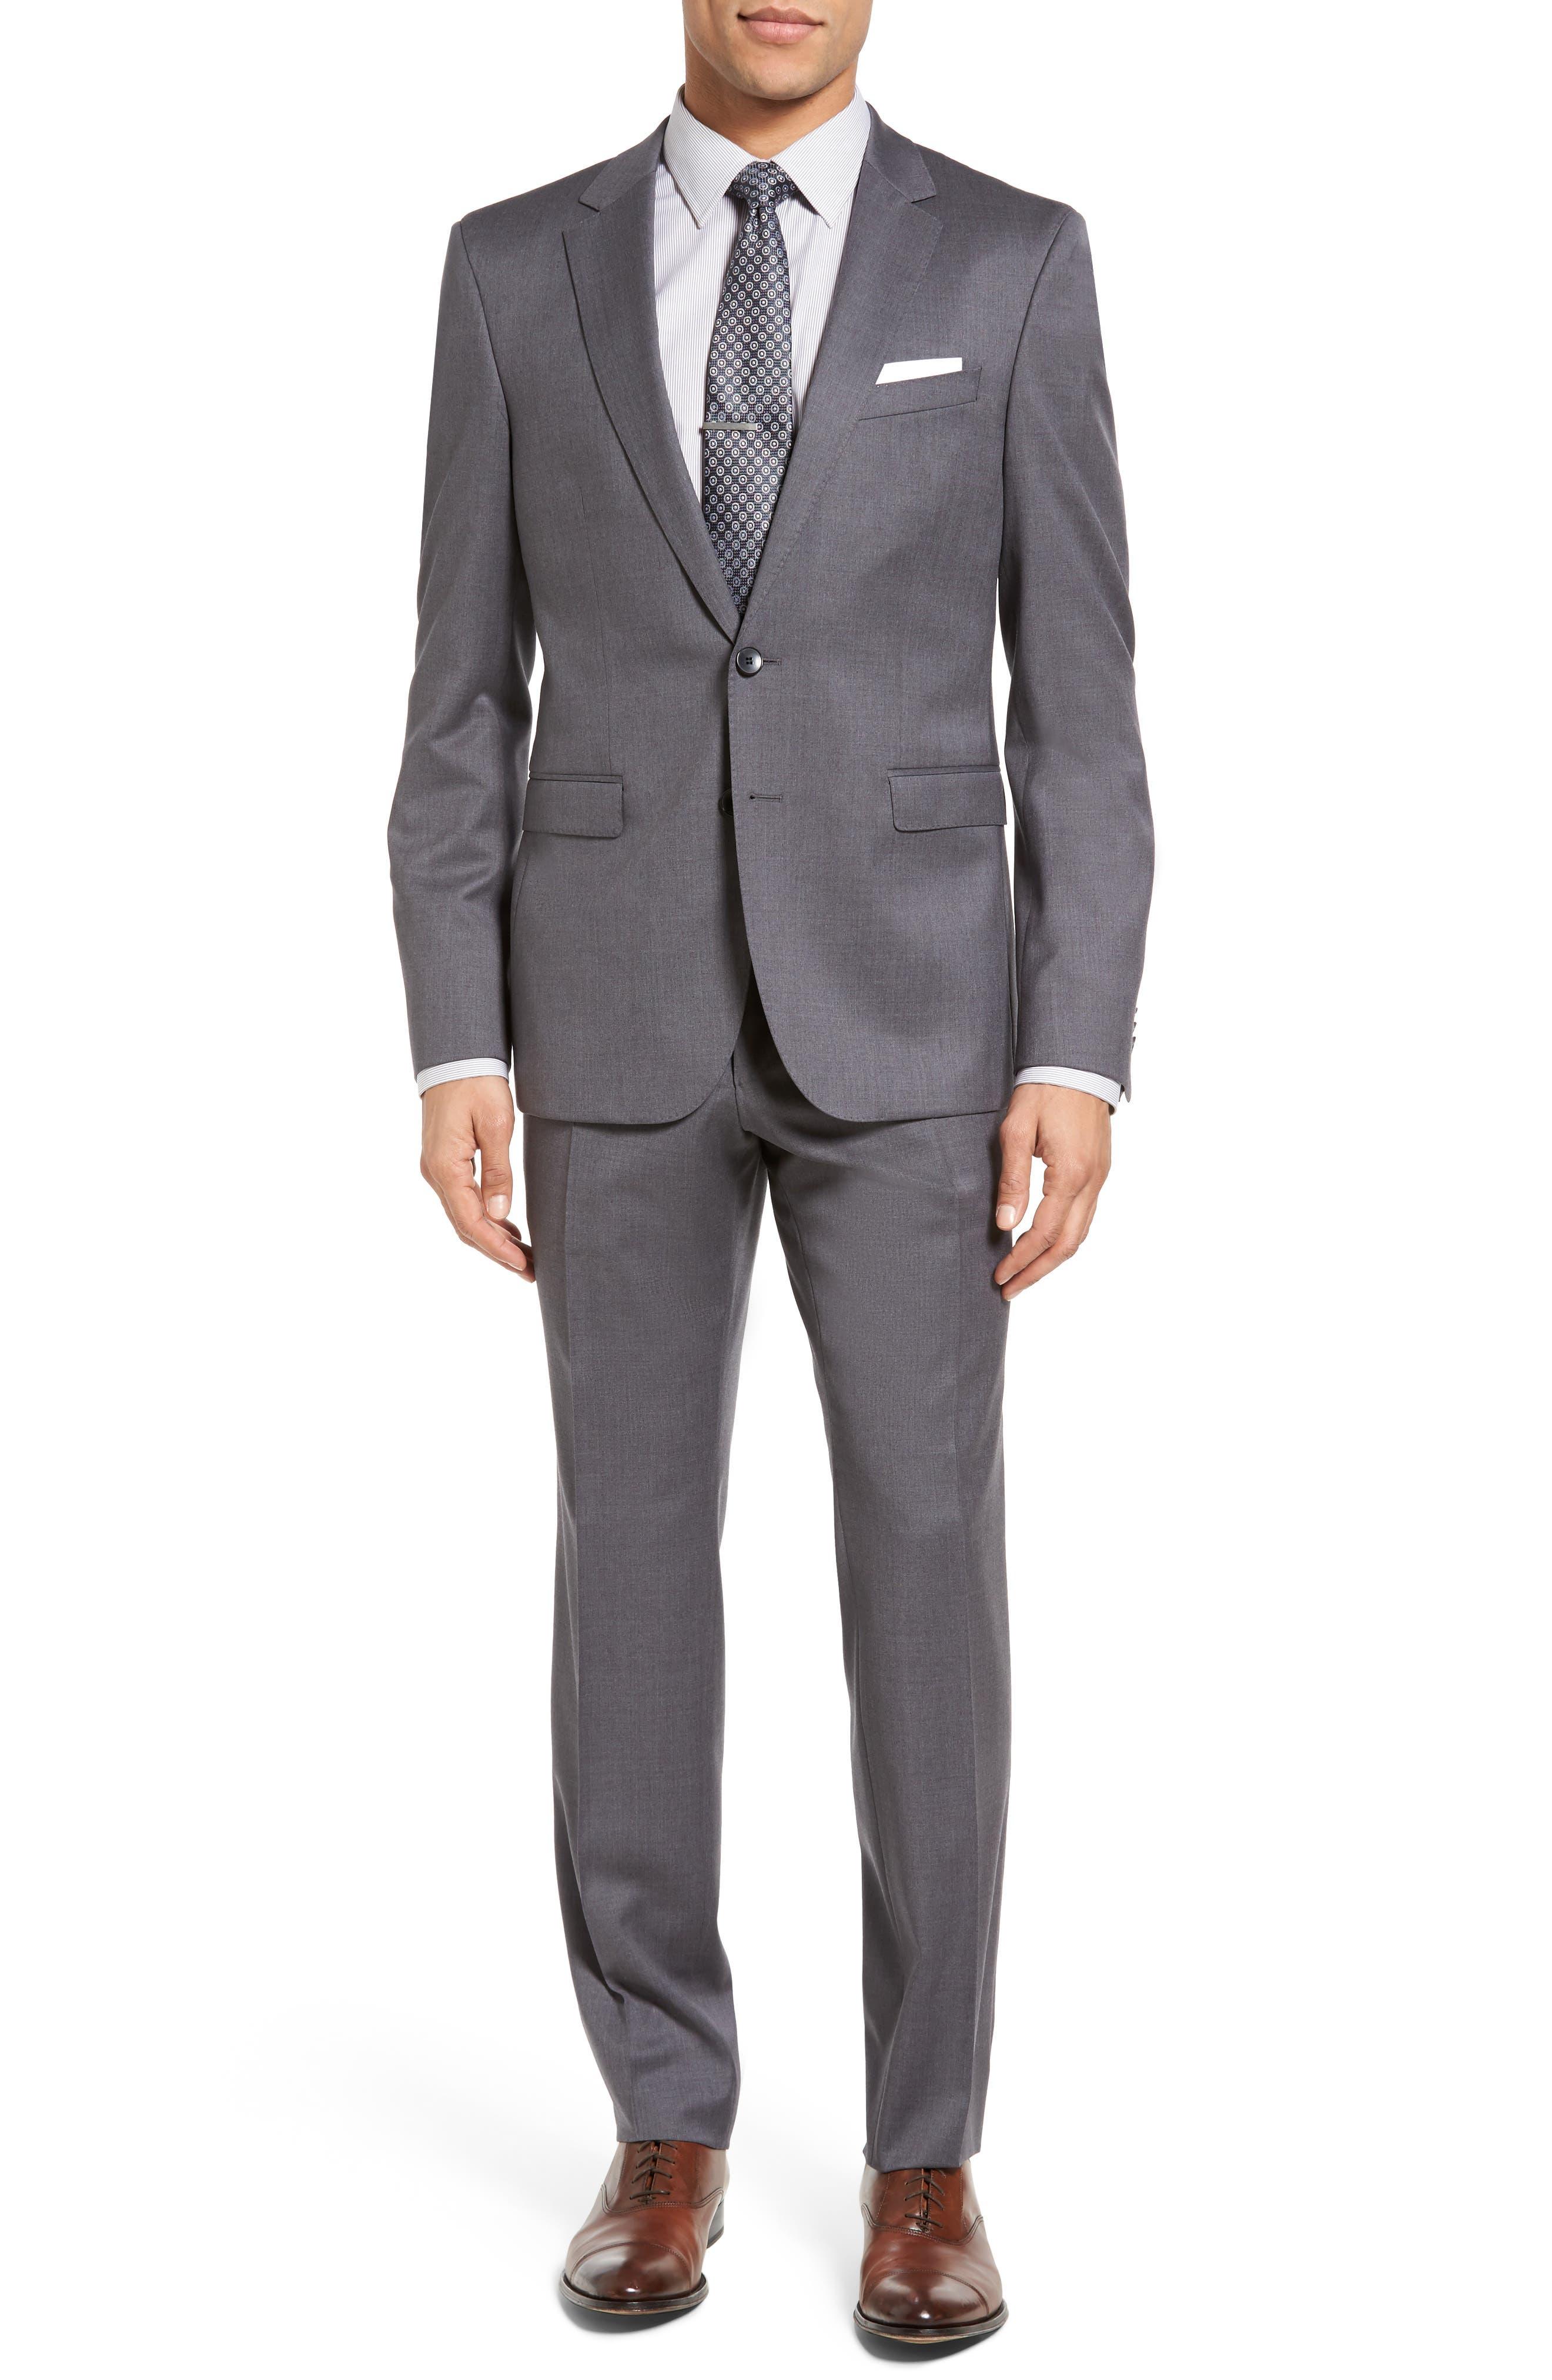 Ryan/Win Trim Fit Solid Wool Suit,                             Main thumbnail 1, color,                             031